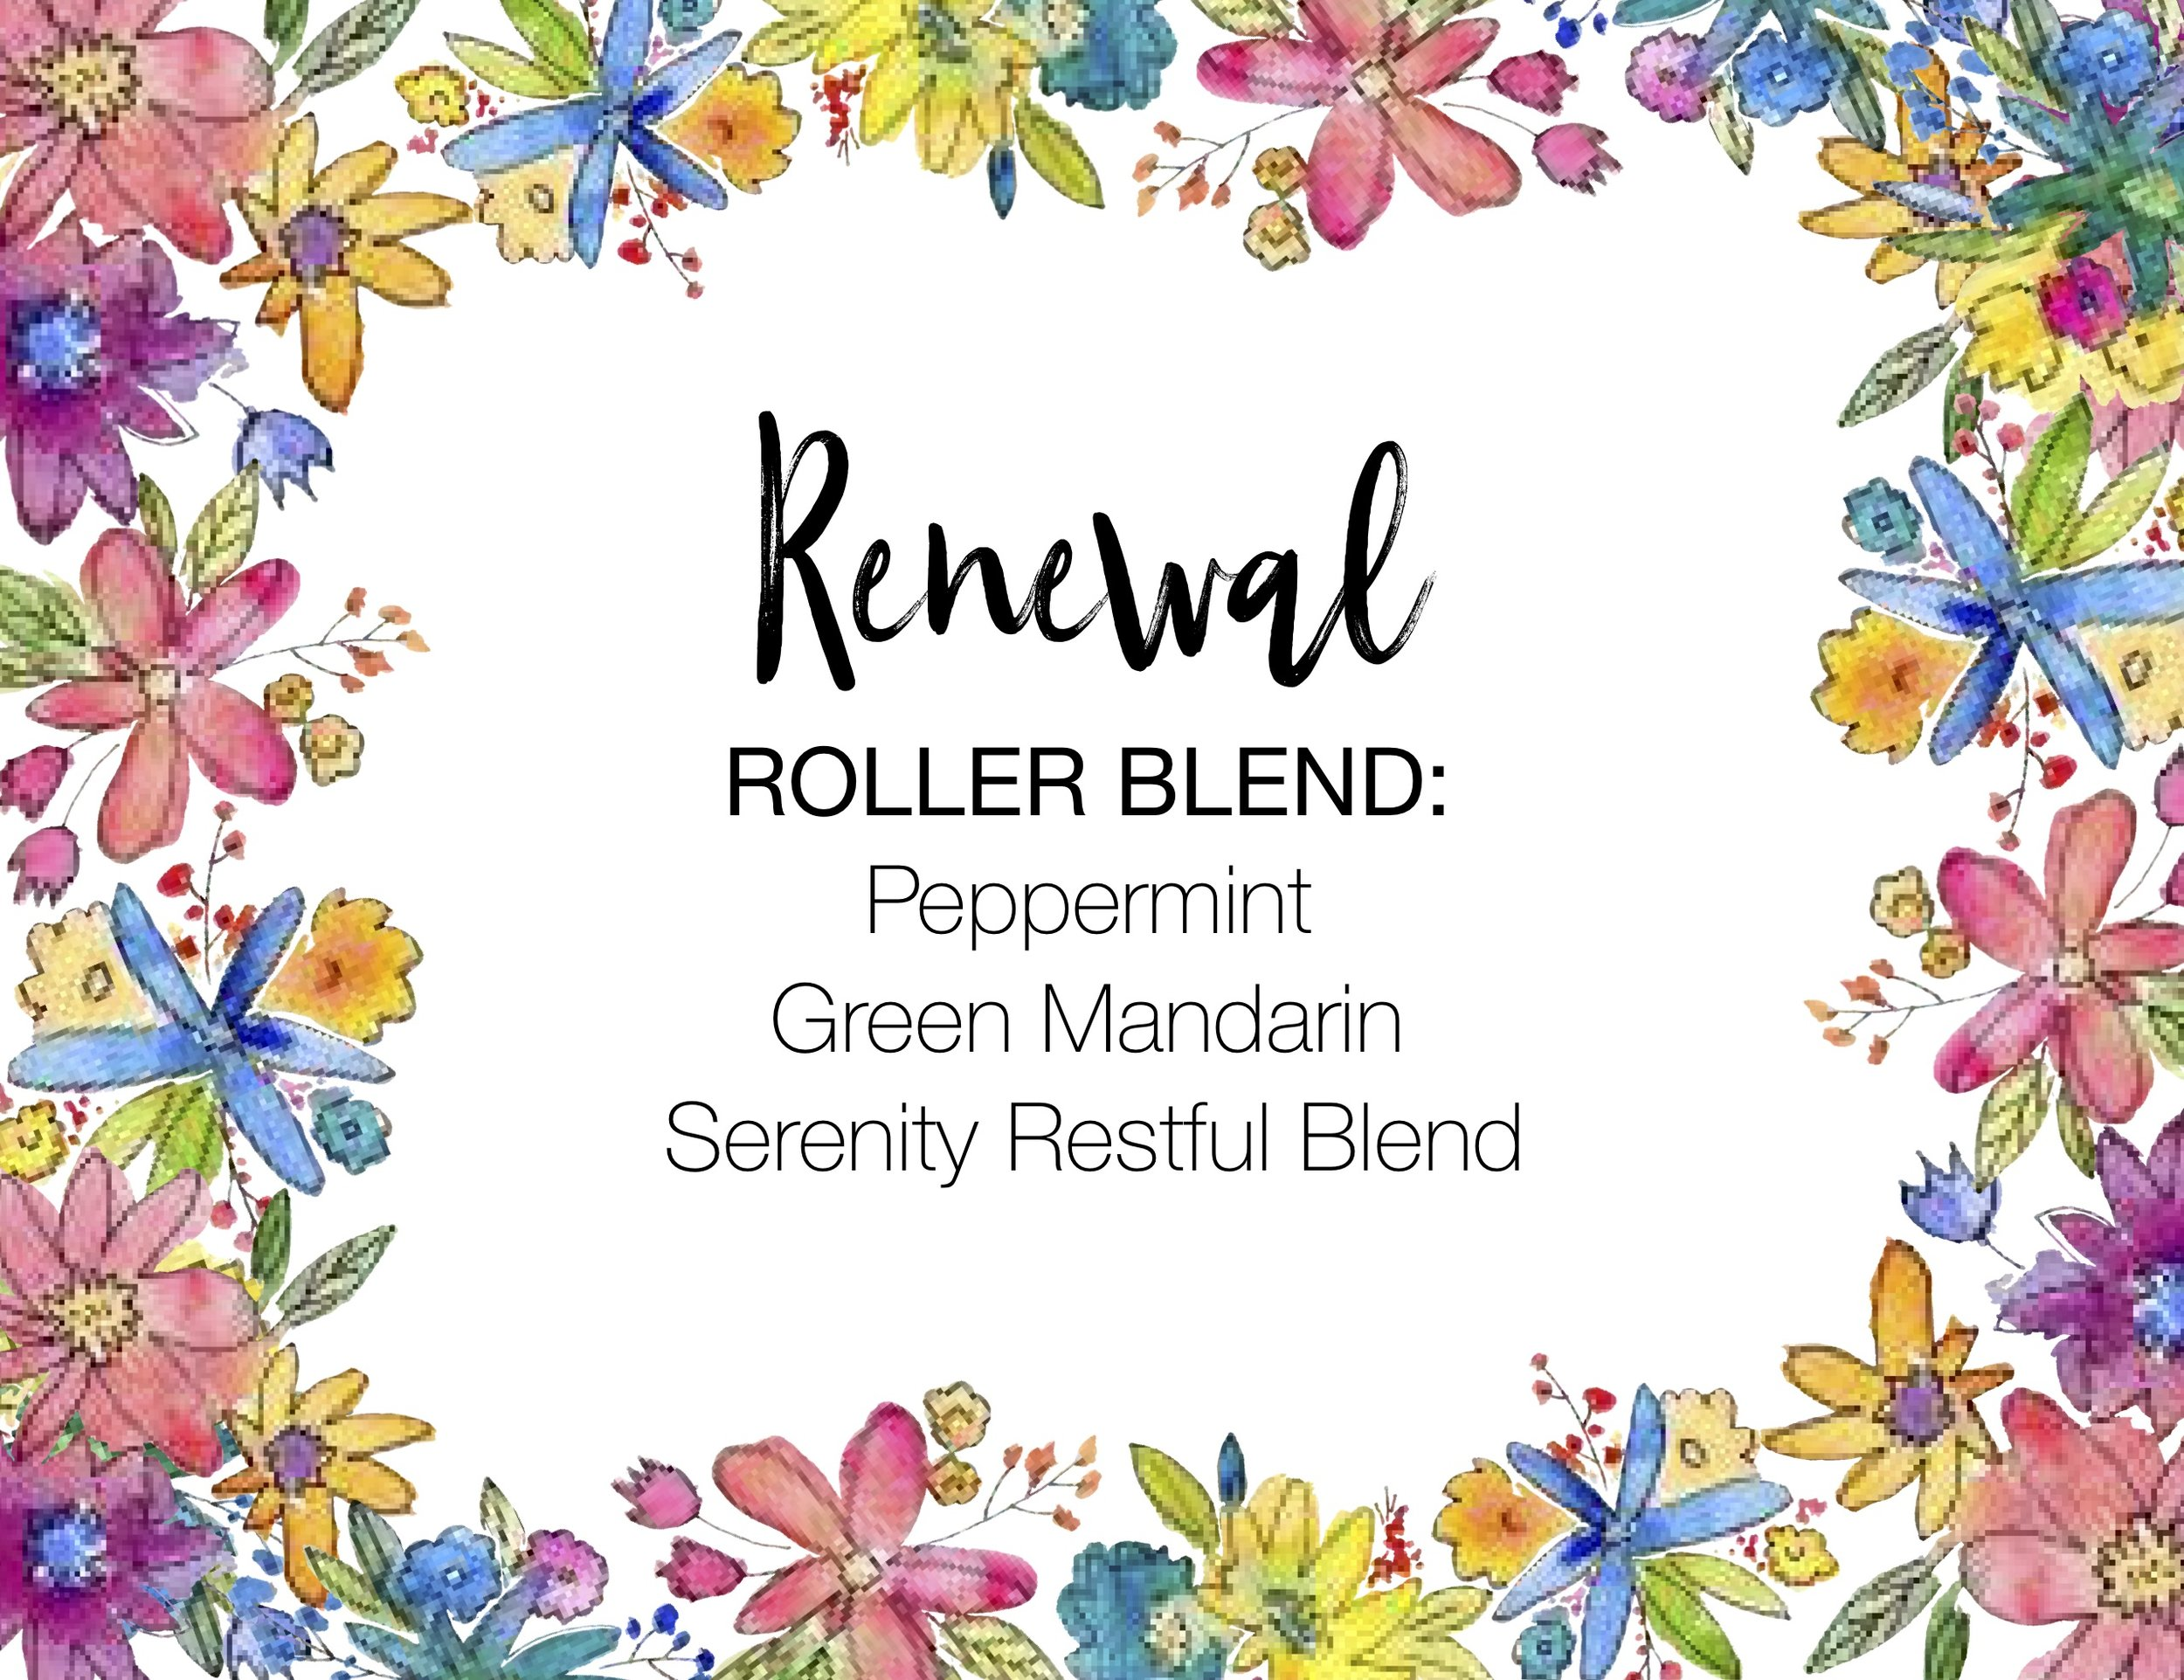 Renewal Rollerbotle Blend LABEL JPEG.jpg